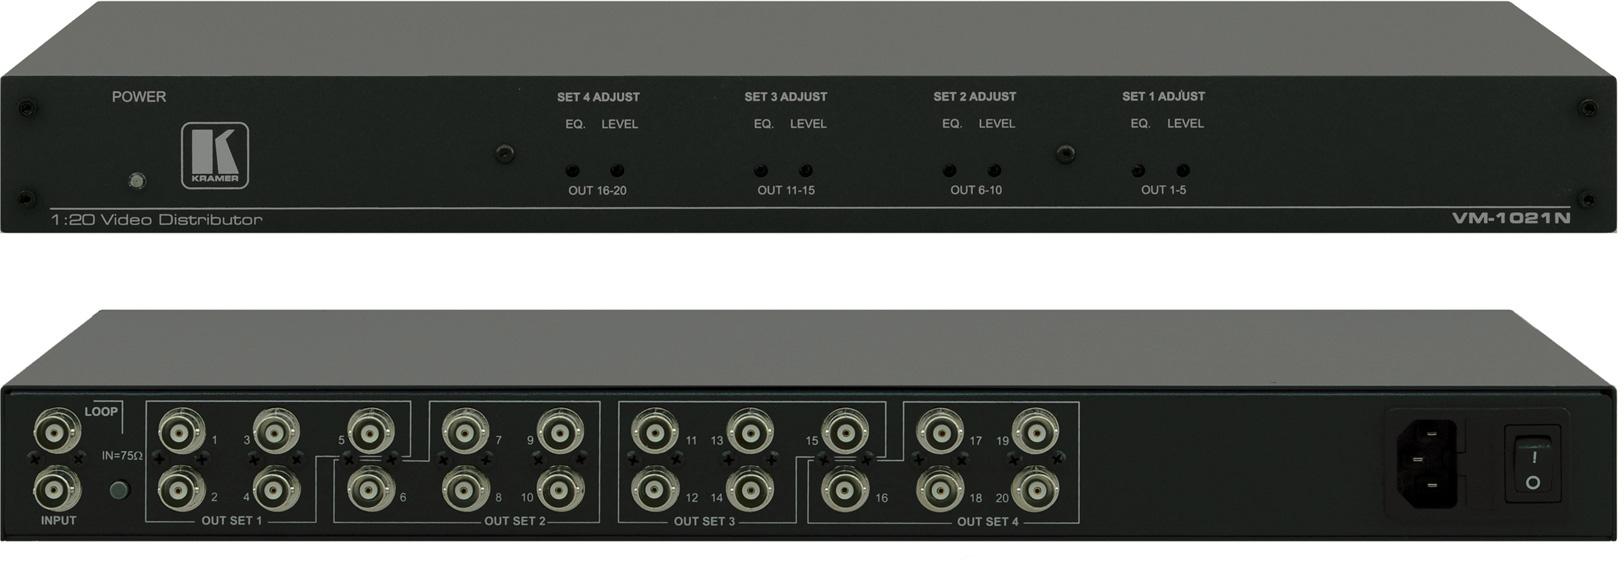 kramer vm 1021n 1 20 composite sdi video distribution amplifier